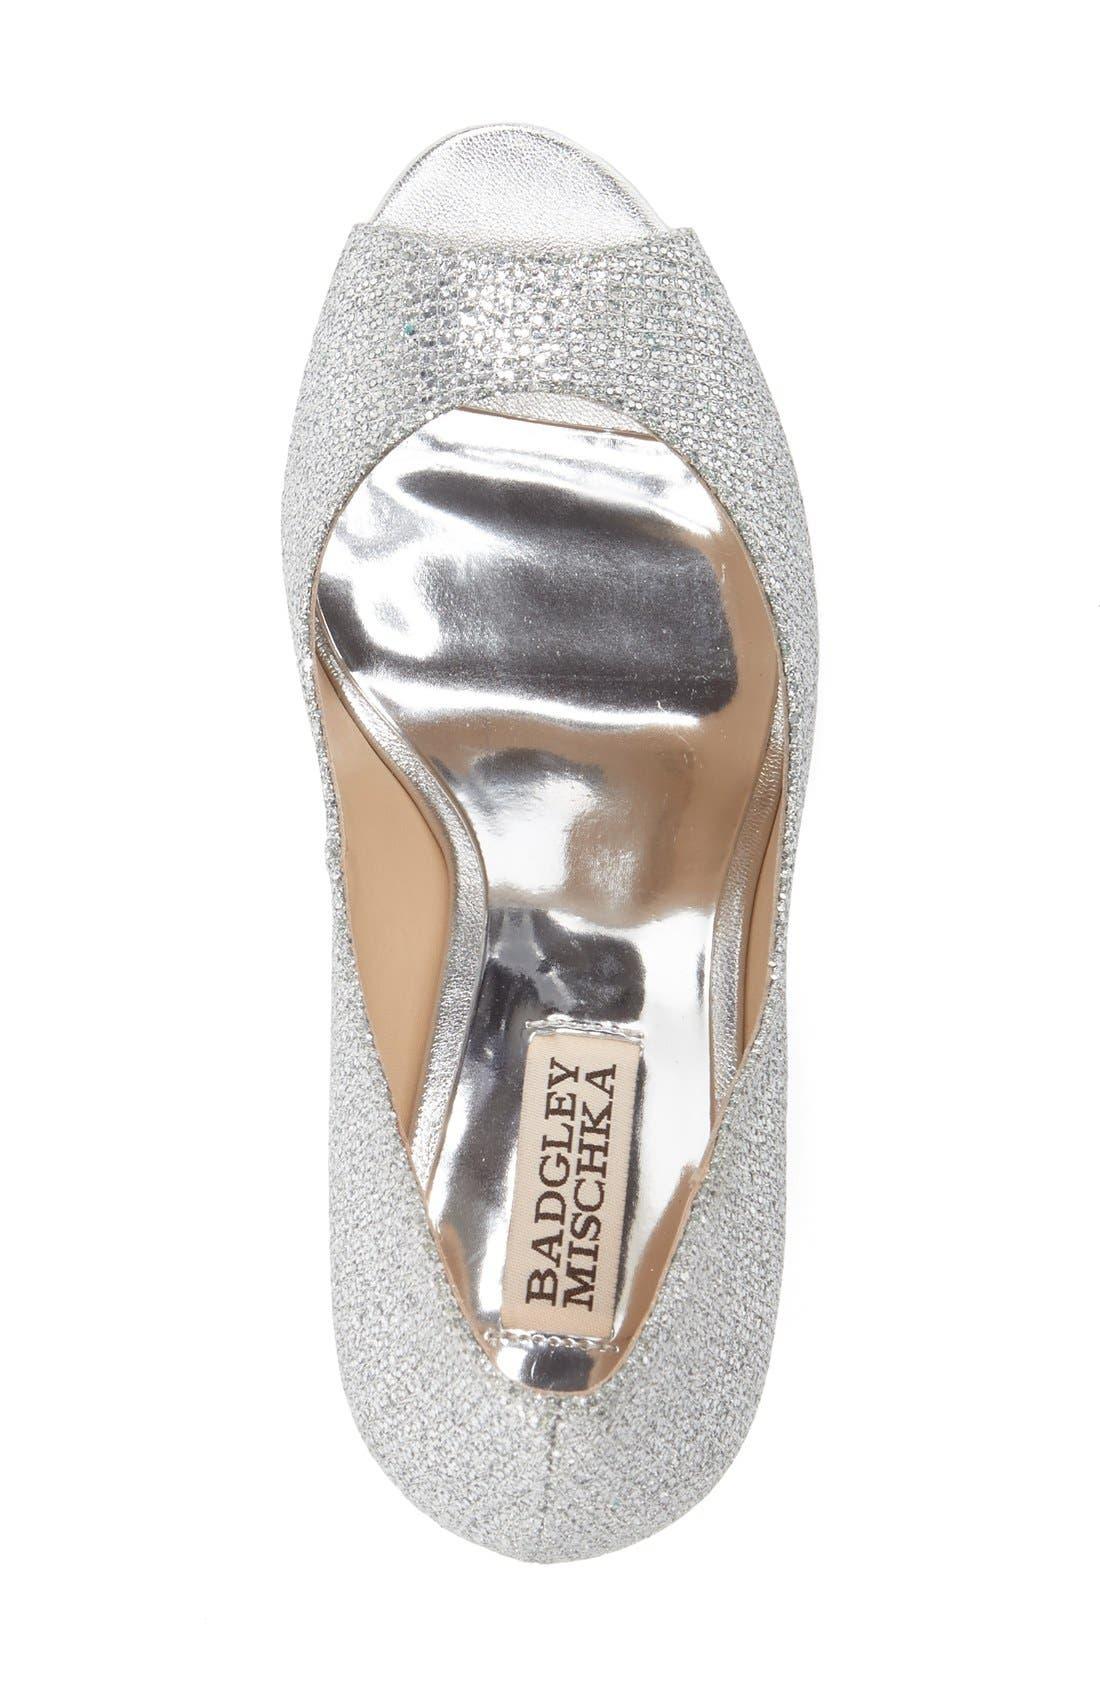 Alternate Image 3  - Badgley Mischka 'Awake' Embellished Peep Toe Wedge Pump (Women)